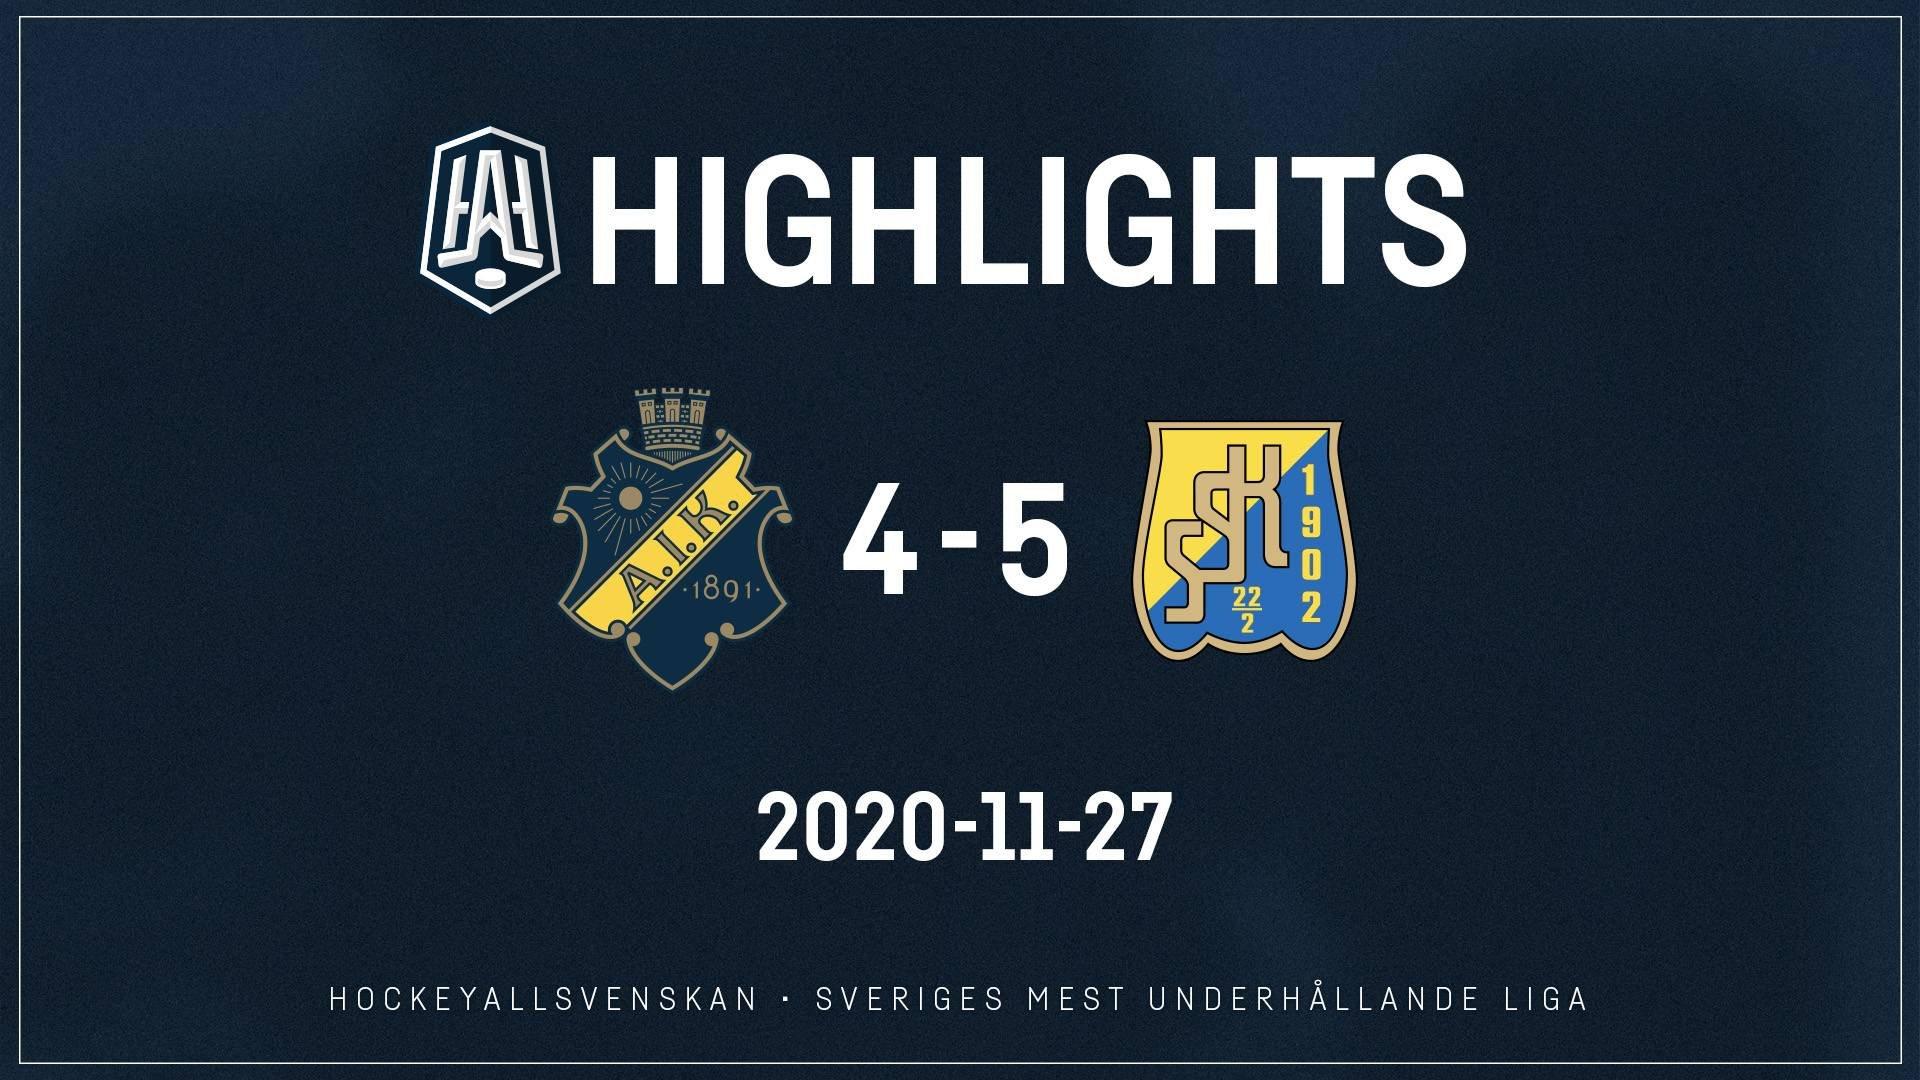 2020-11-27 AIK - Södertälje 4-5